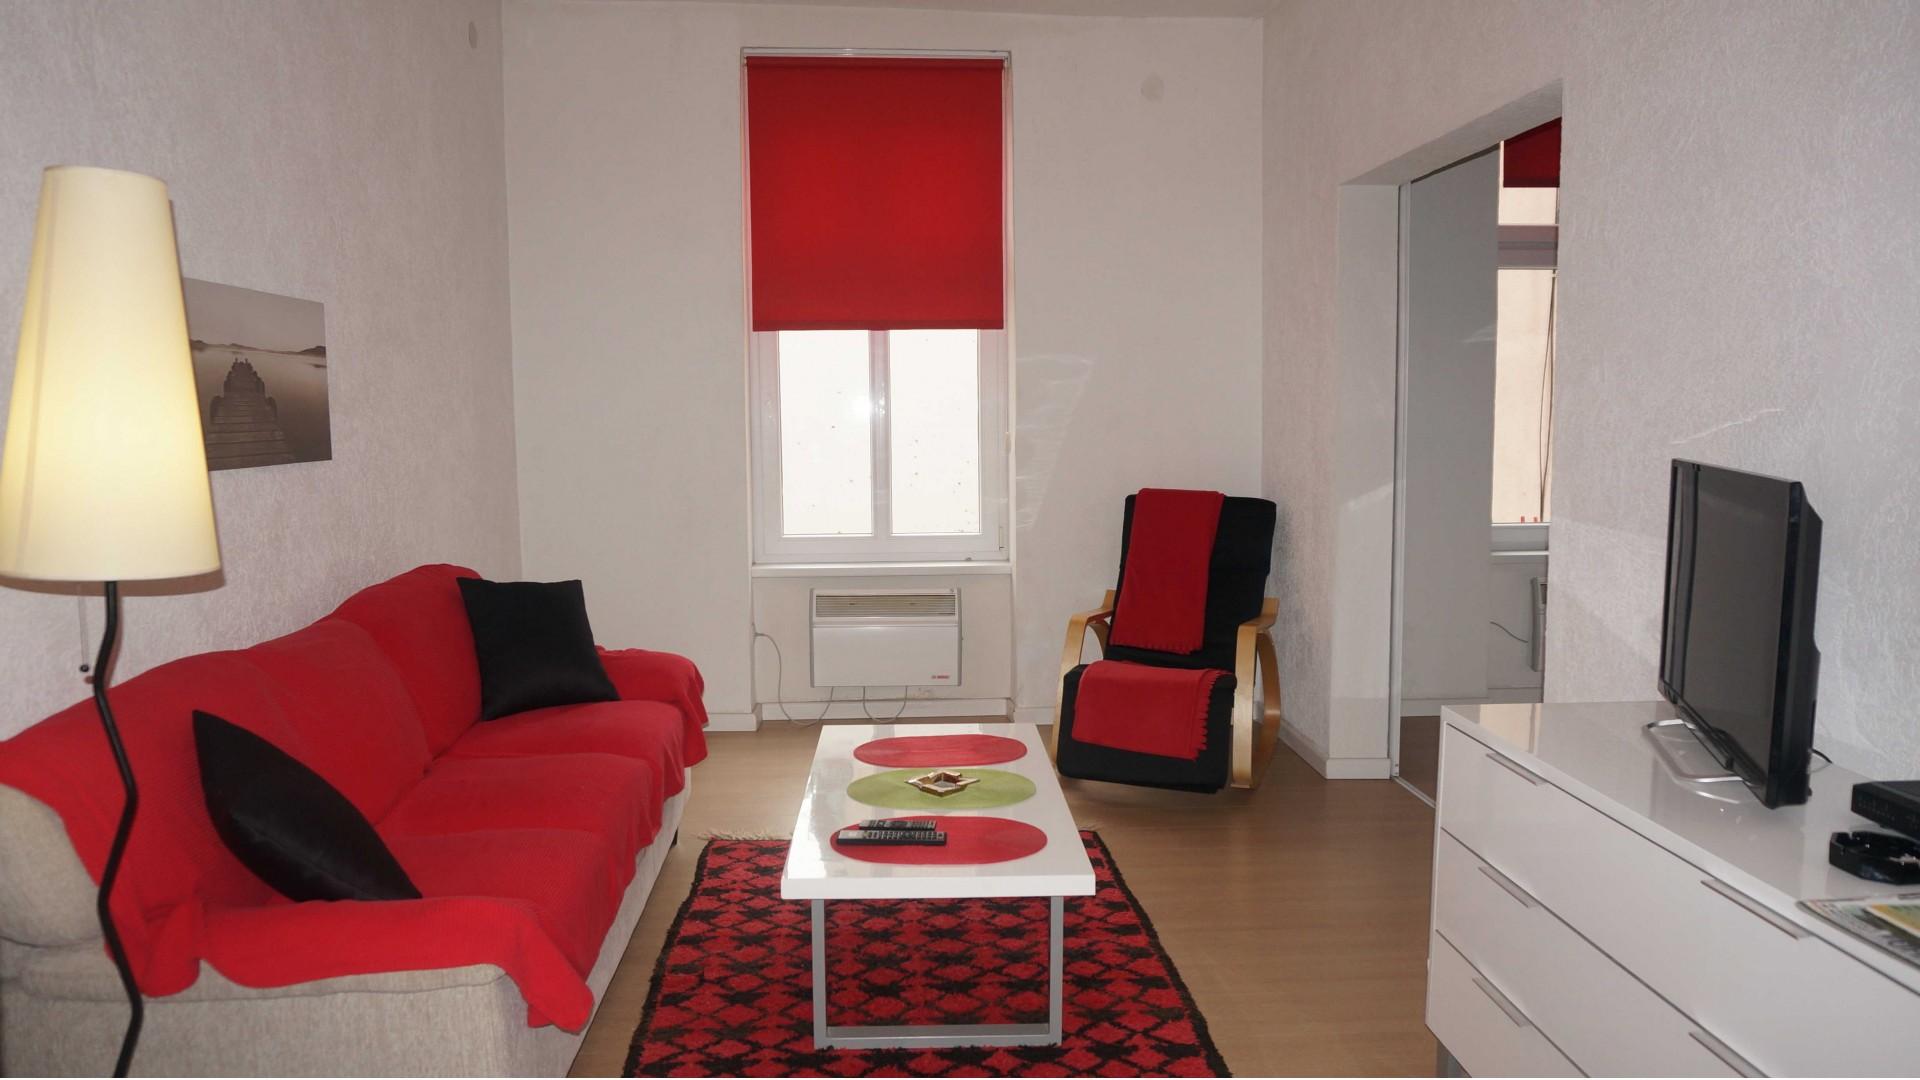 Manji dvosoban stan u strogom centru grada